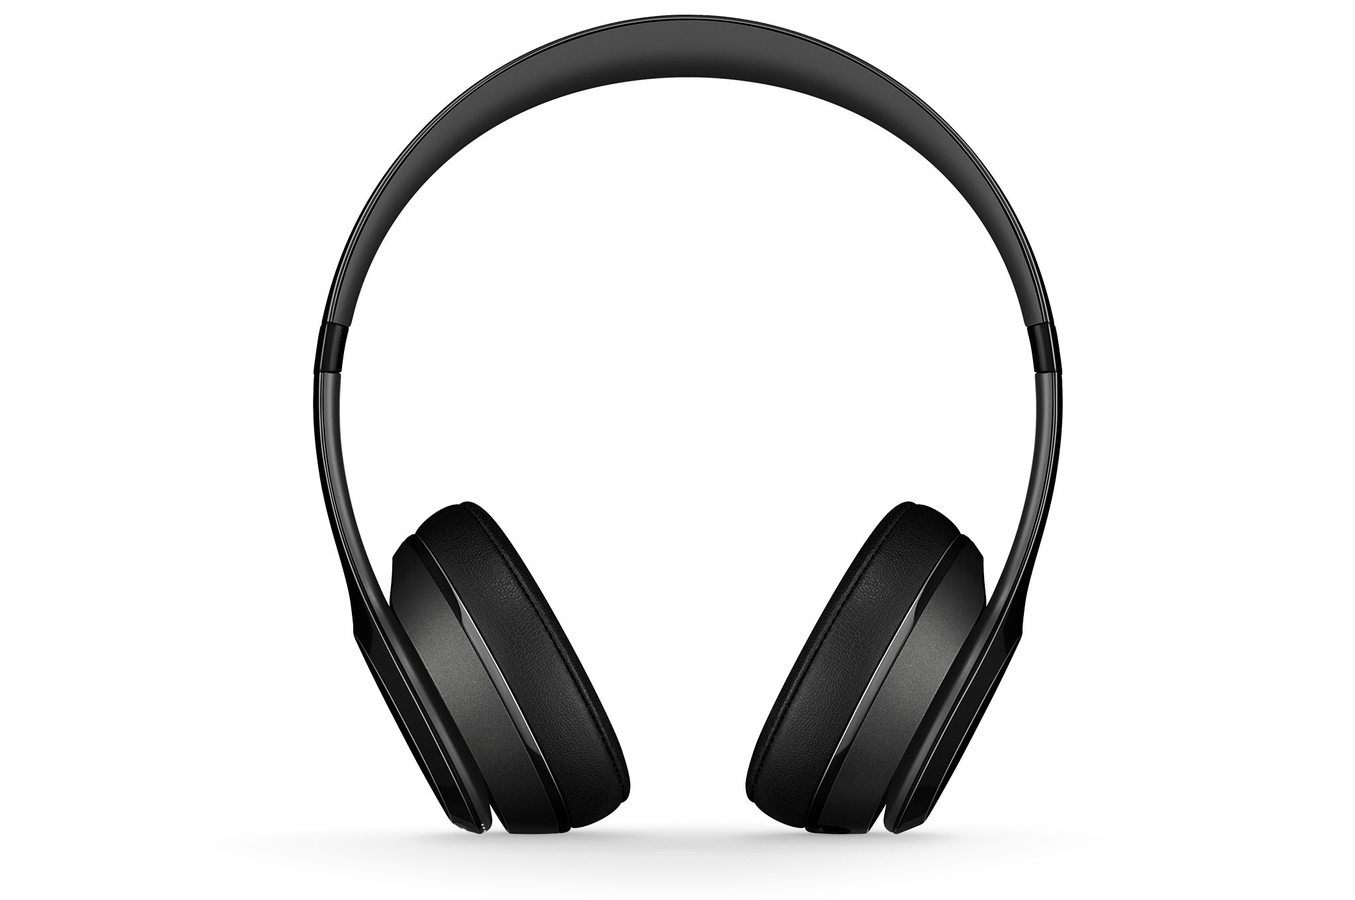 casque audio beats solo v2 wireless noir 4084209 darty. Black Bedroom Furniture Sets. Home Design Ideas